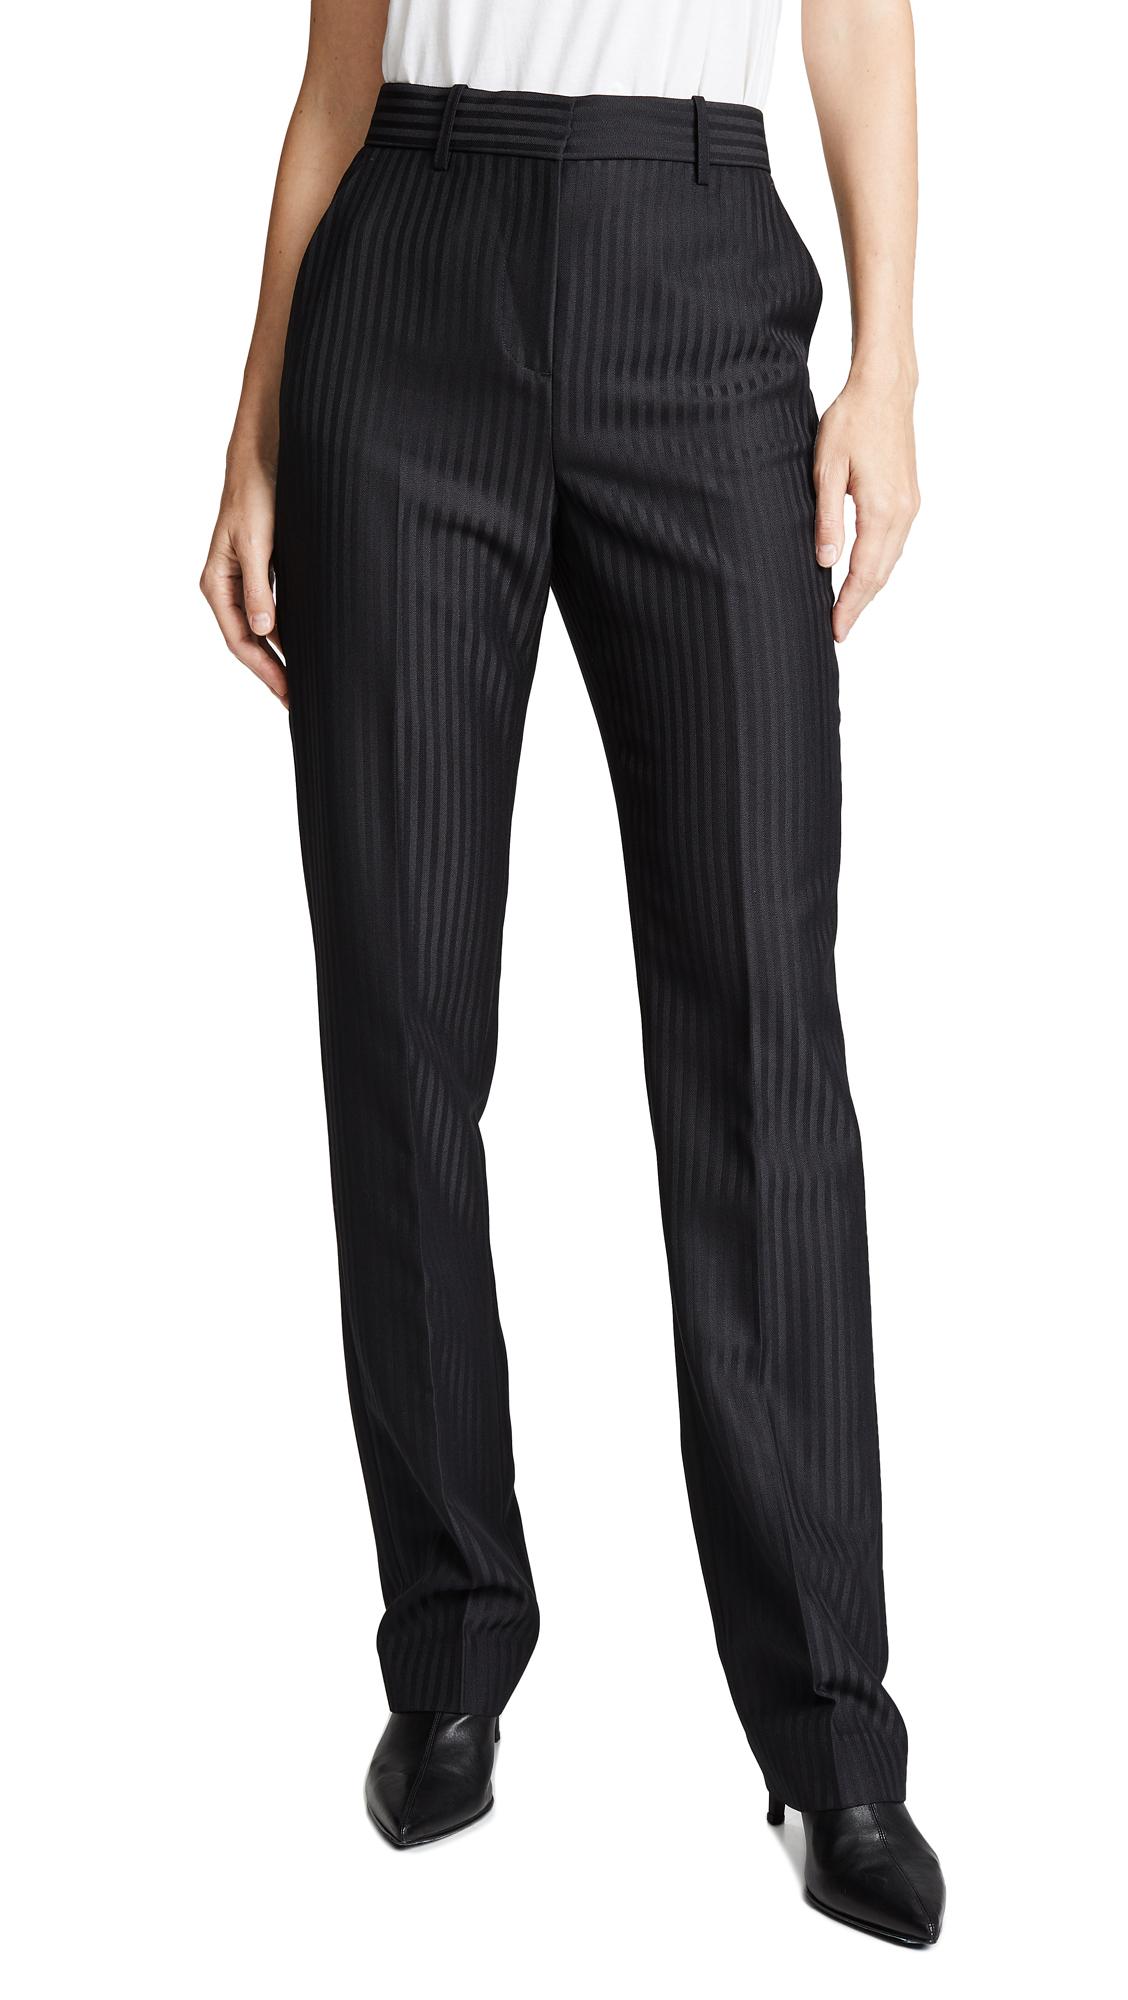 Victoria Victoria Beckham Slim Tailored Pants In Black